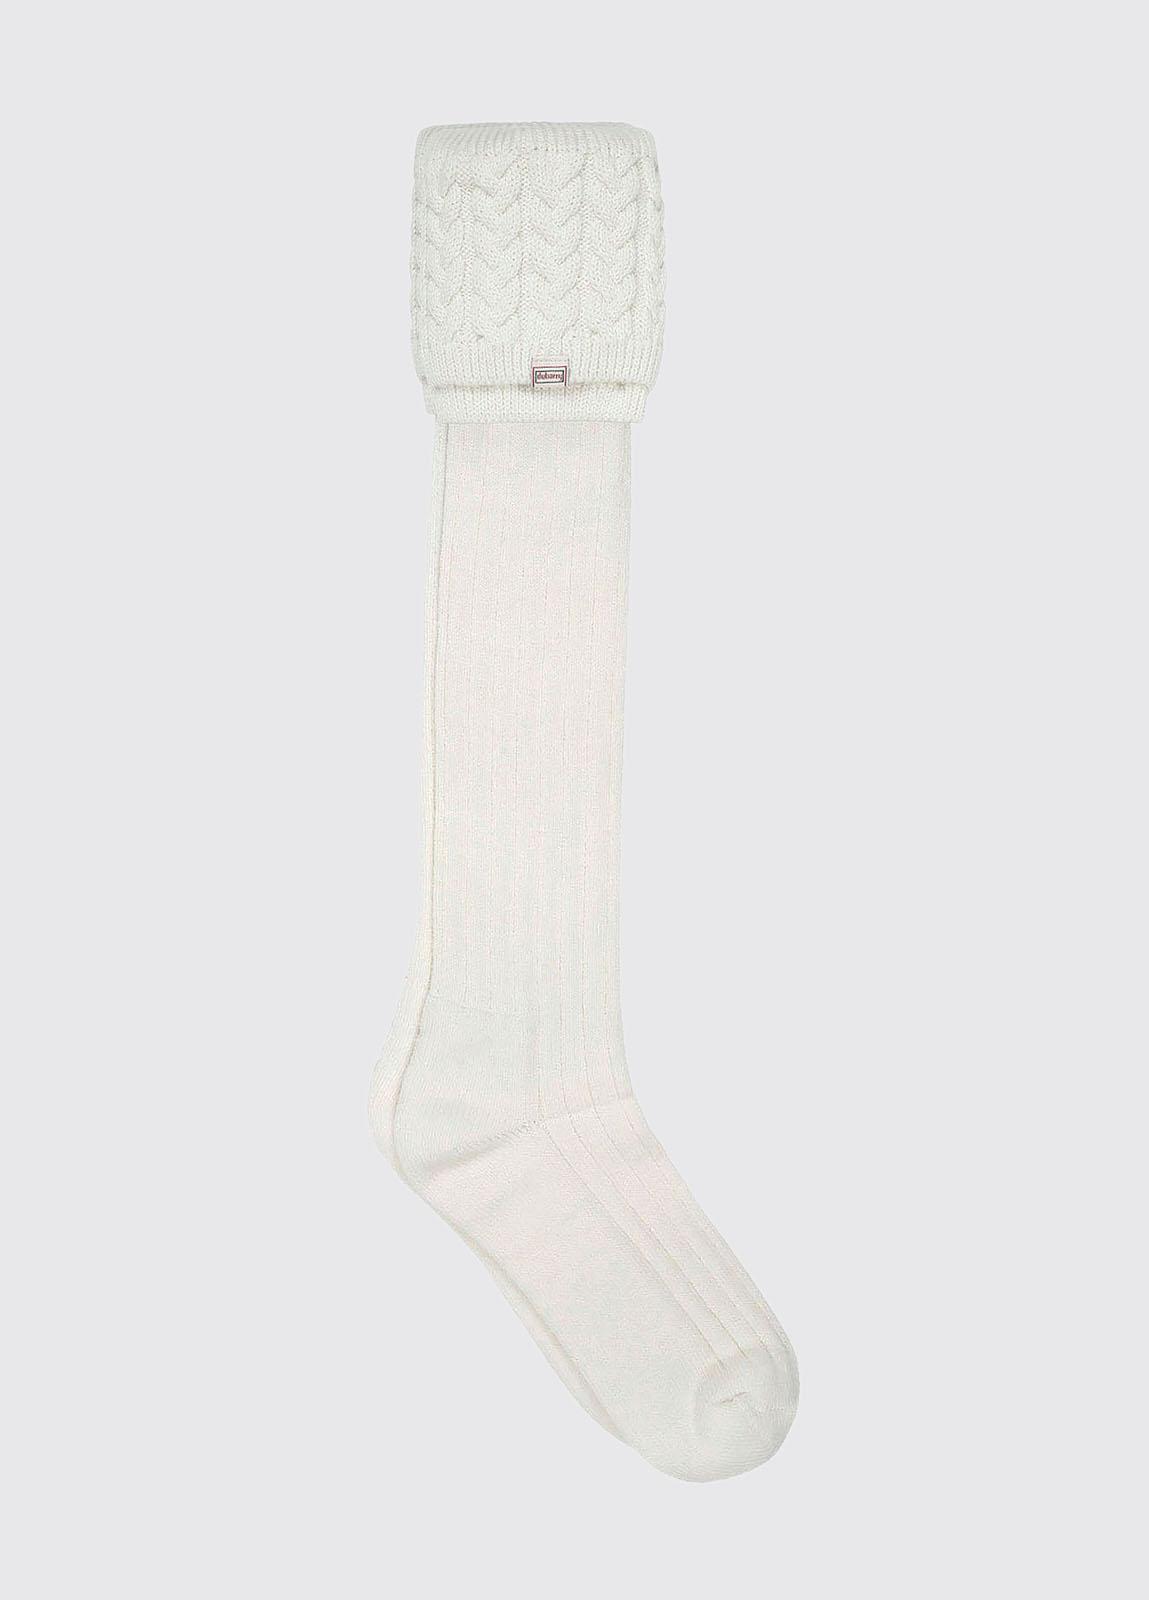 Trinity Socks - Cream